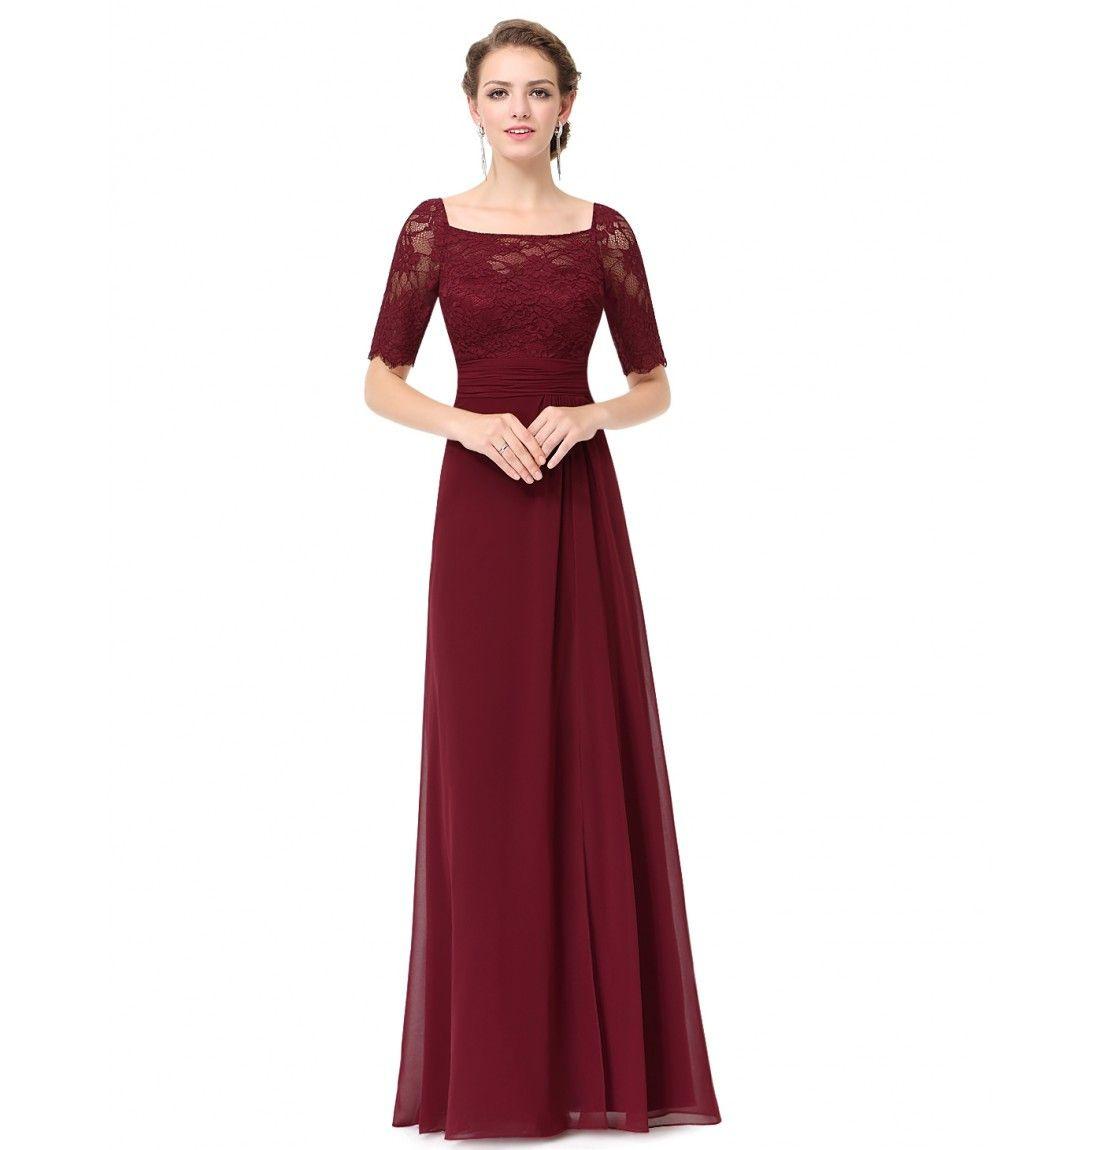 20 Wunderbar Abendkleid Dunkelrot Stylish17 Fantastisch Abendkleid Dunkelrot Bester Preis